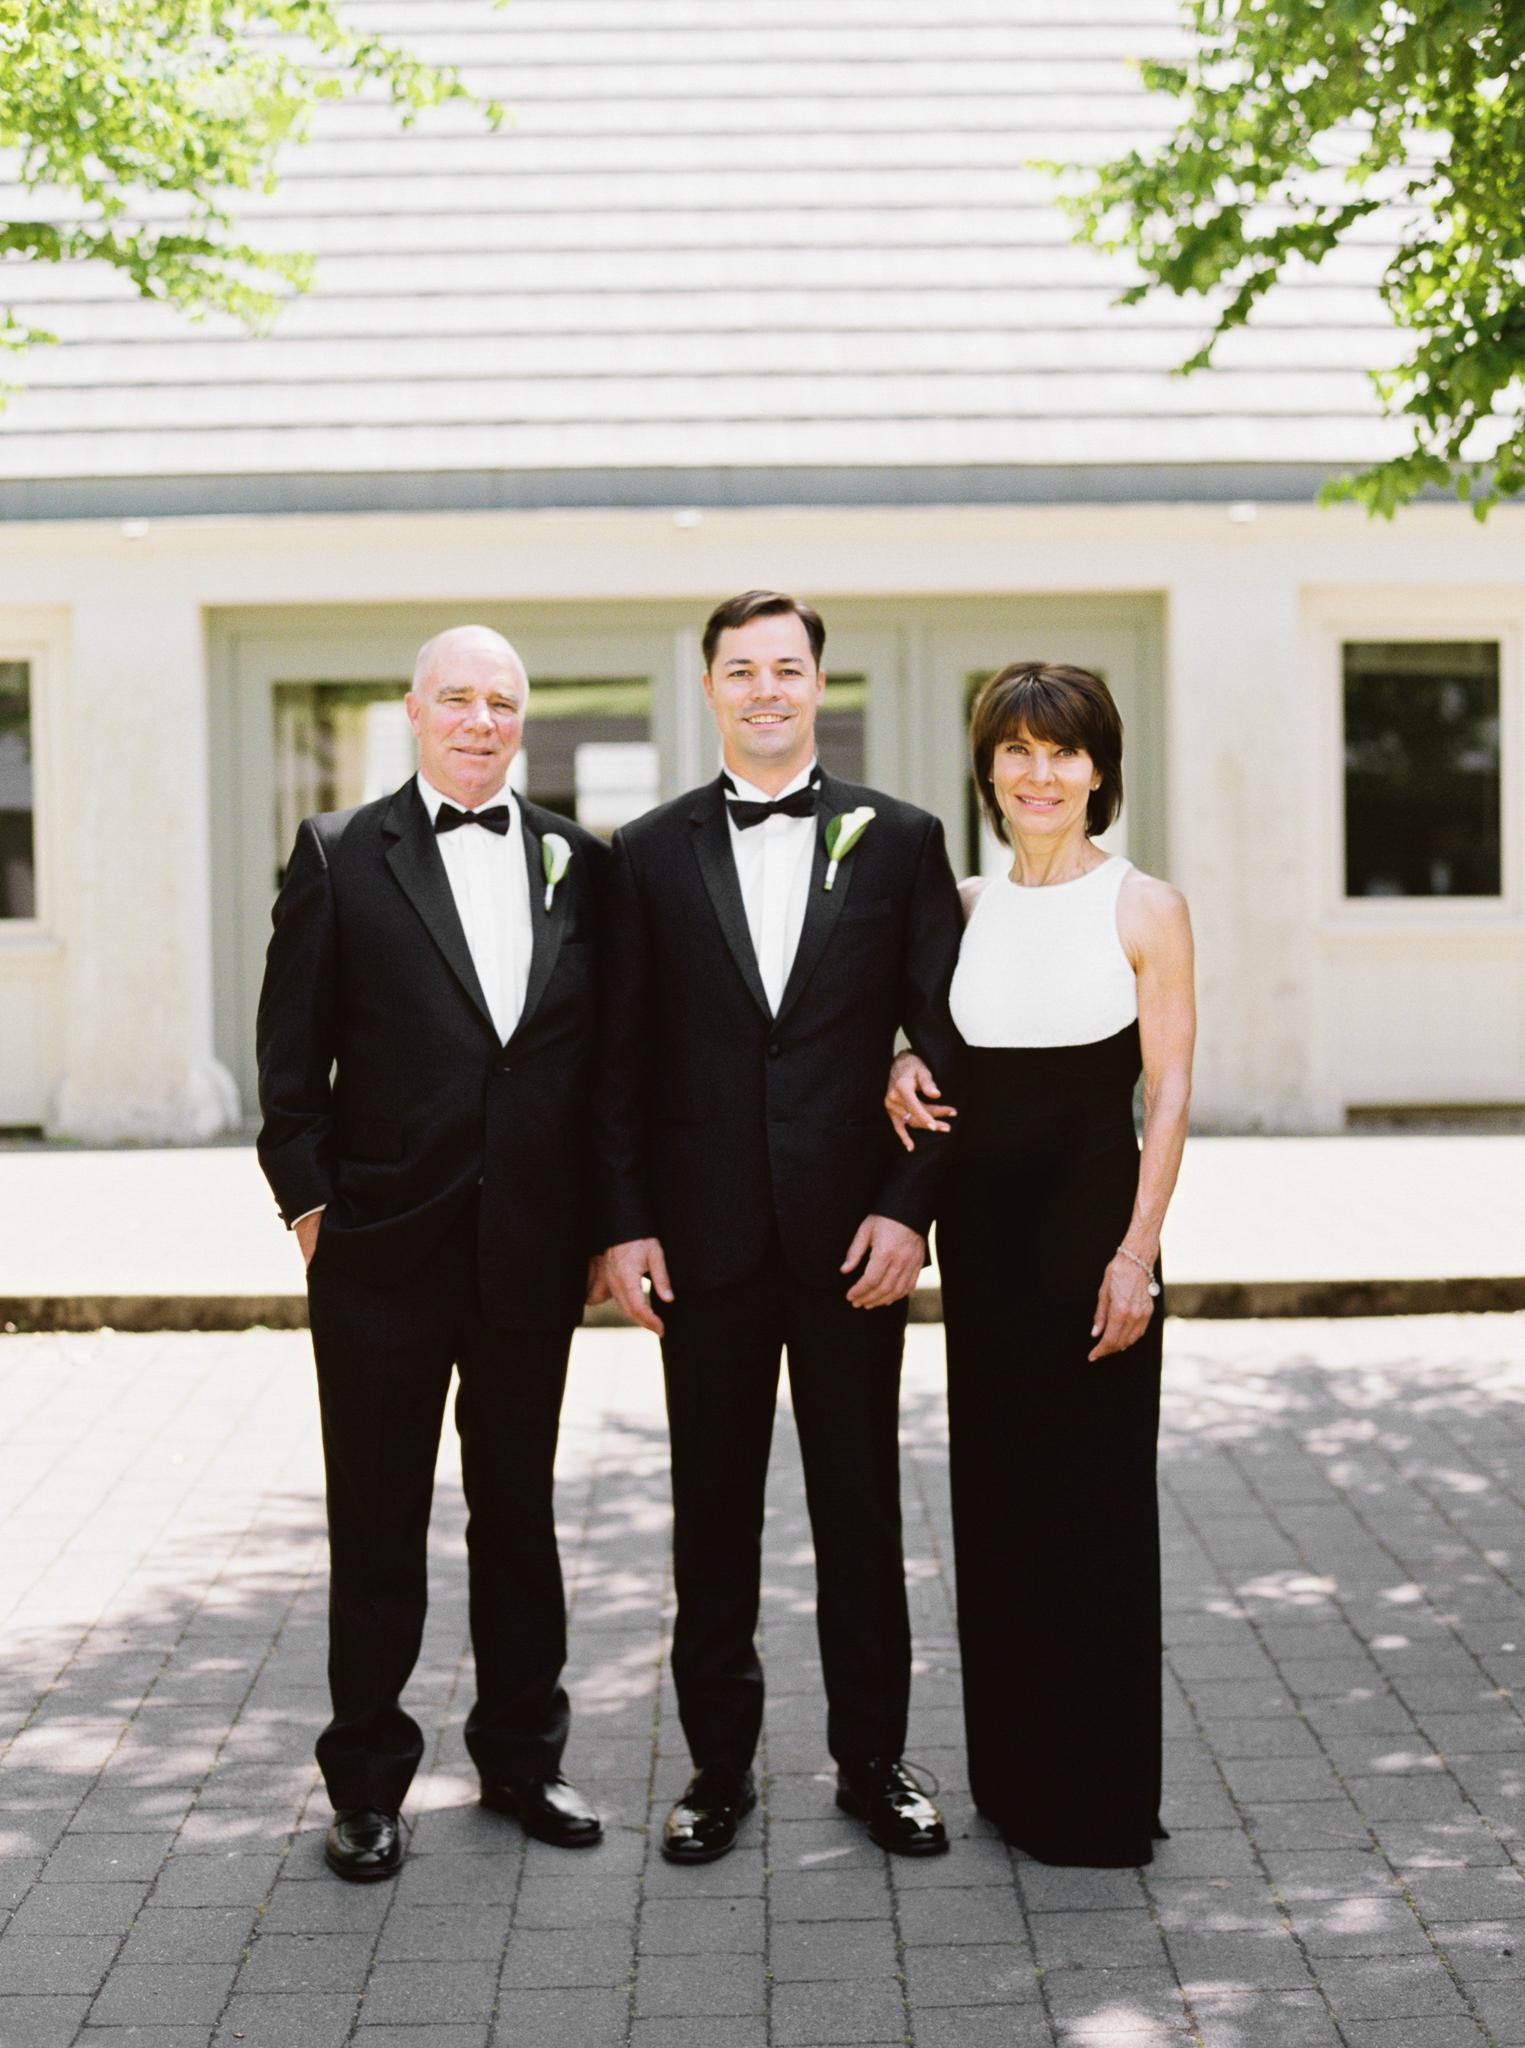 071OutliveCreative_Travel_Photographer_Videographer_Lewis&Clark_Oregon_Elegant_BlackTie_Destination_Wedding.jpg